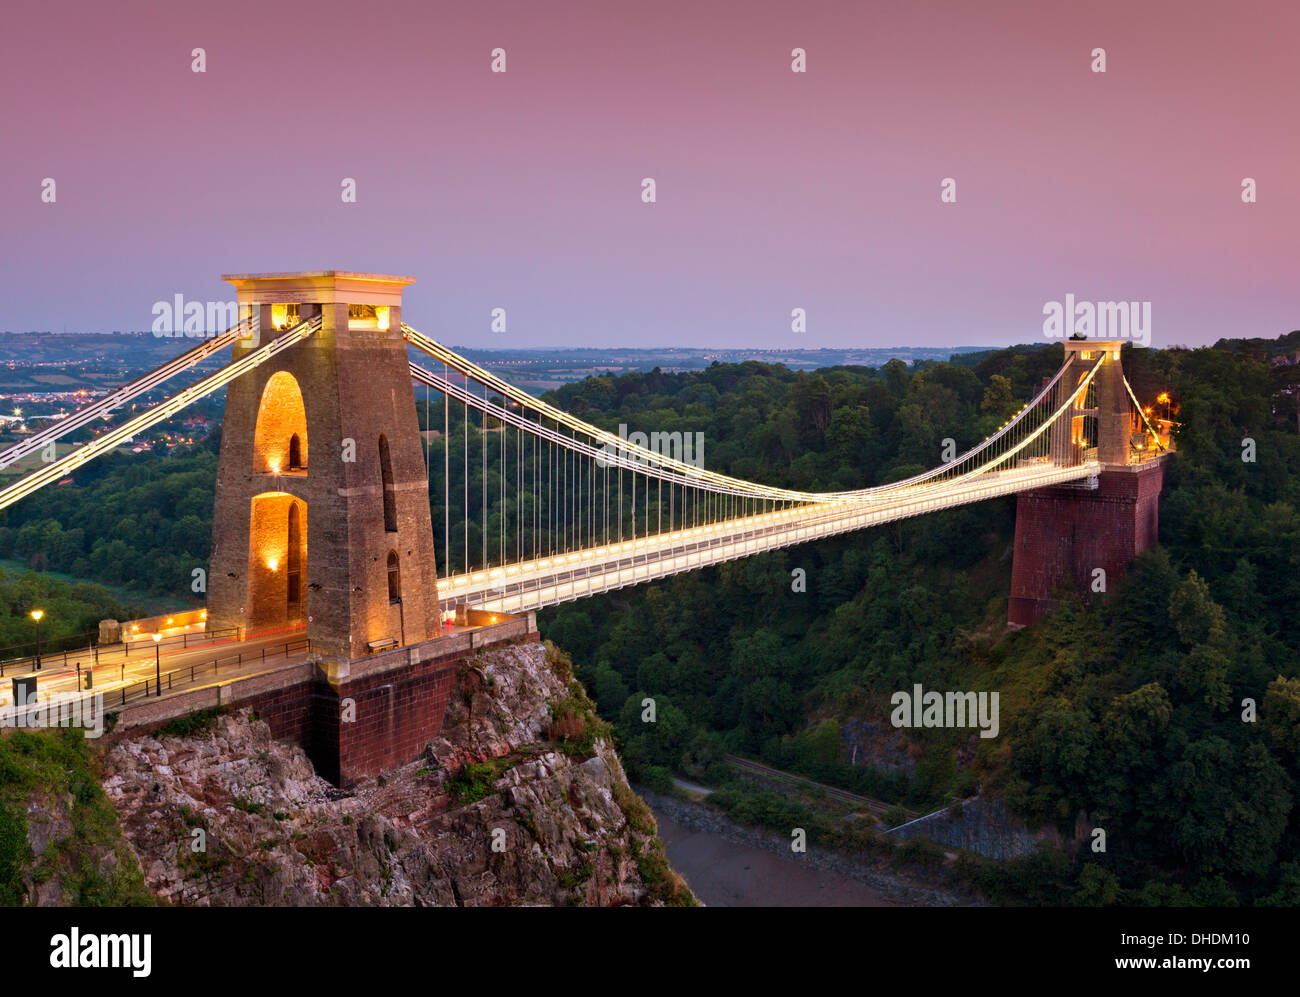 Clifton suspension bridge illuminated at night sunset clifton downs Bristol Avon South West England UK GB EU Europe - Stock Image